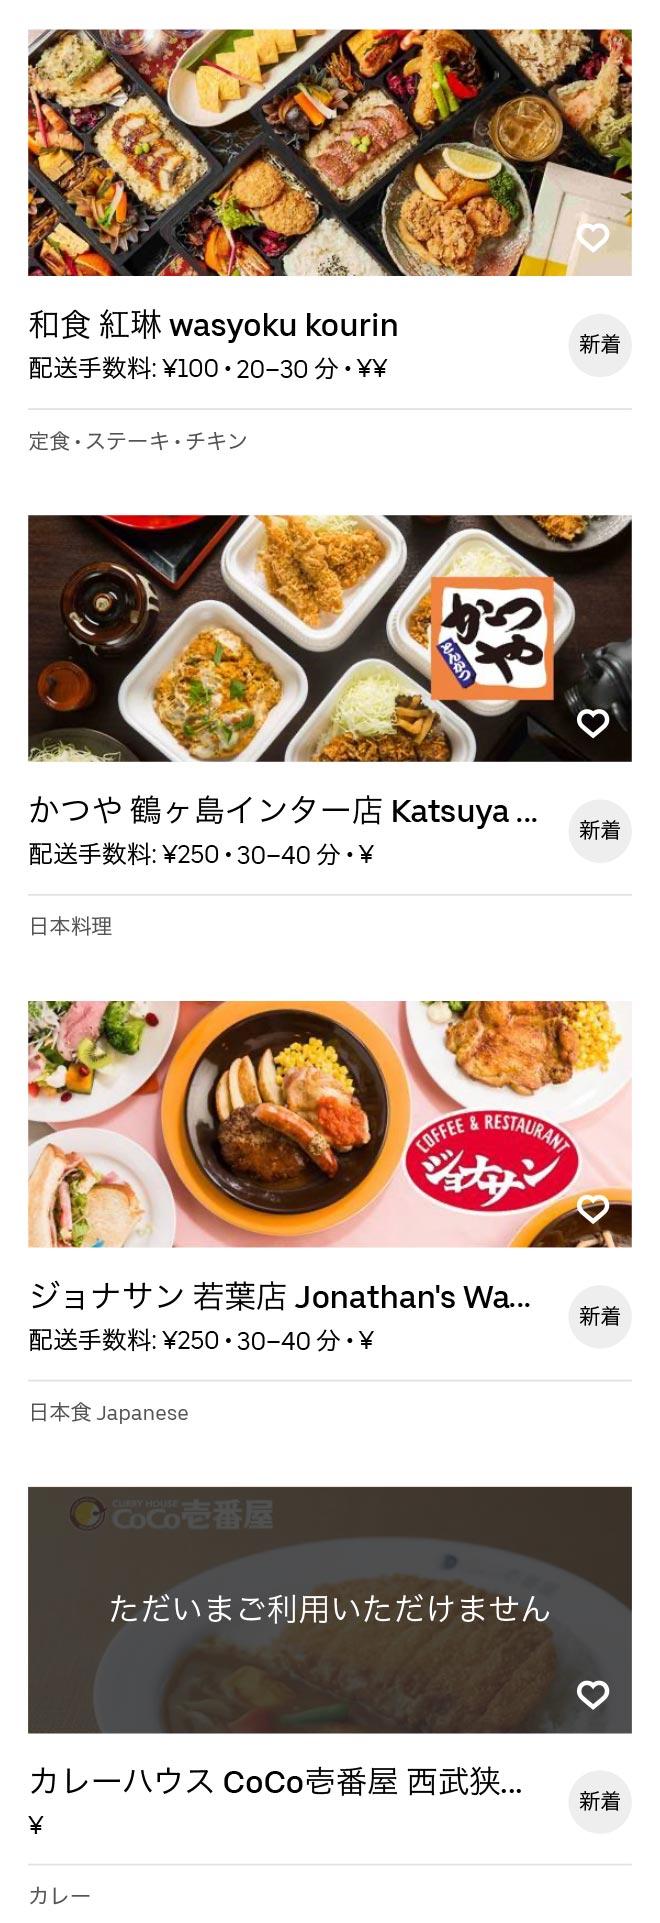 Sakado menu 2010 06